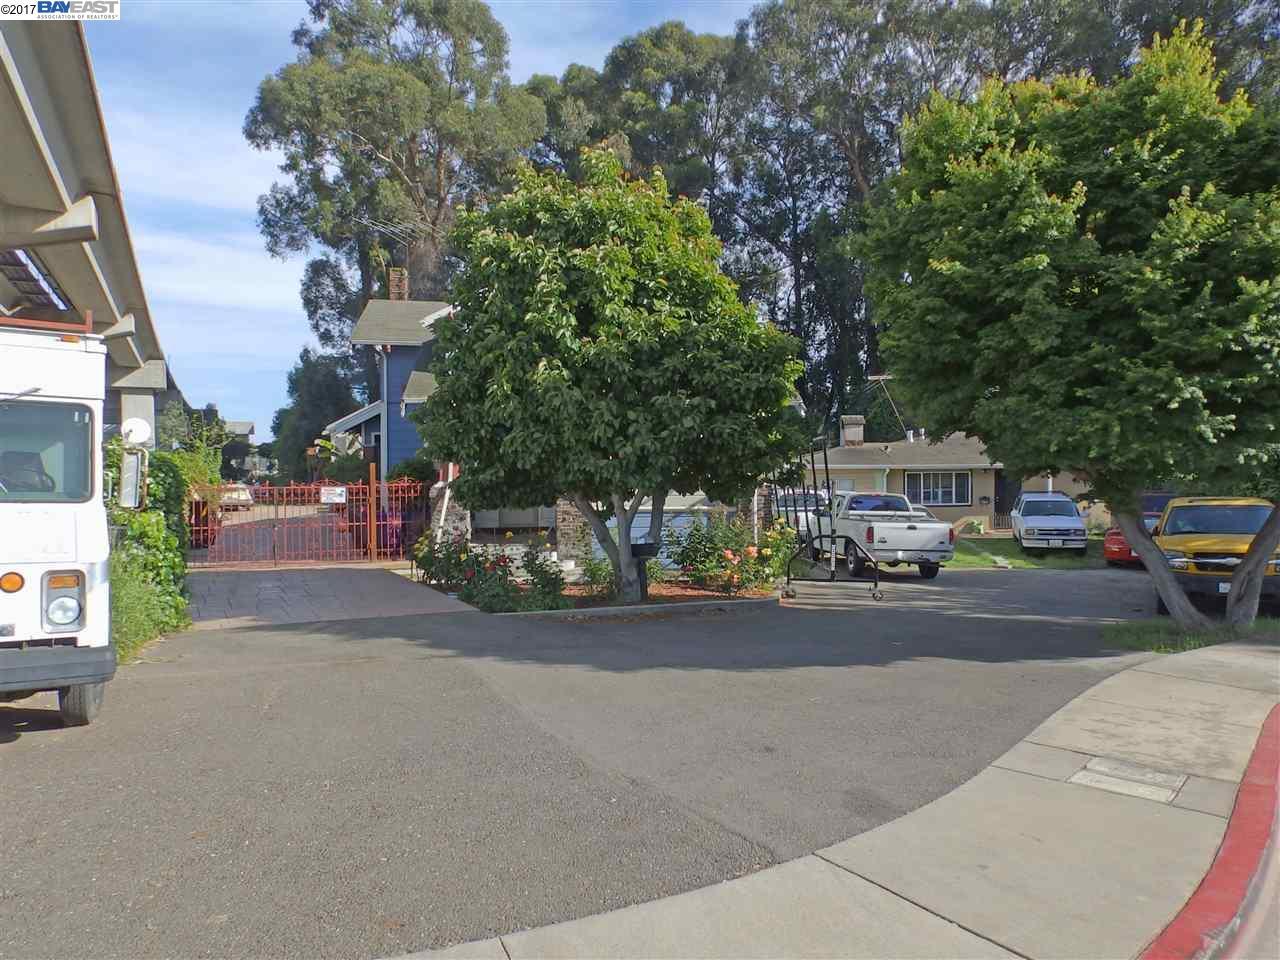 Multi-Family Home for Sale at 707 Peralta Avenue San Leandro, California 94577 United States